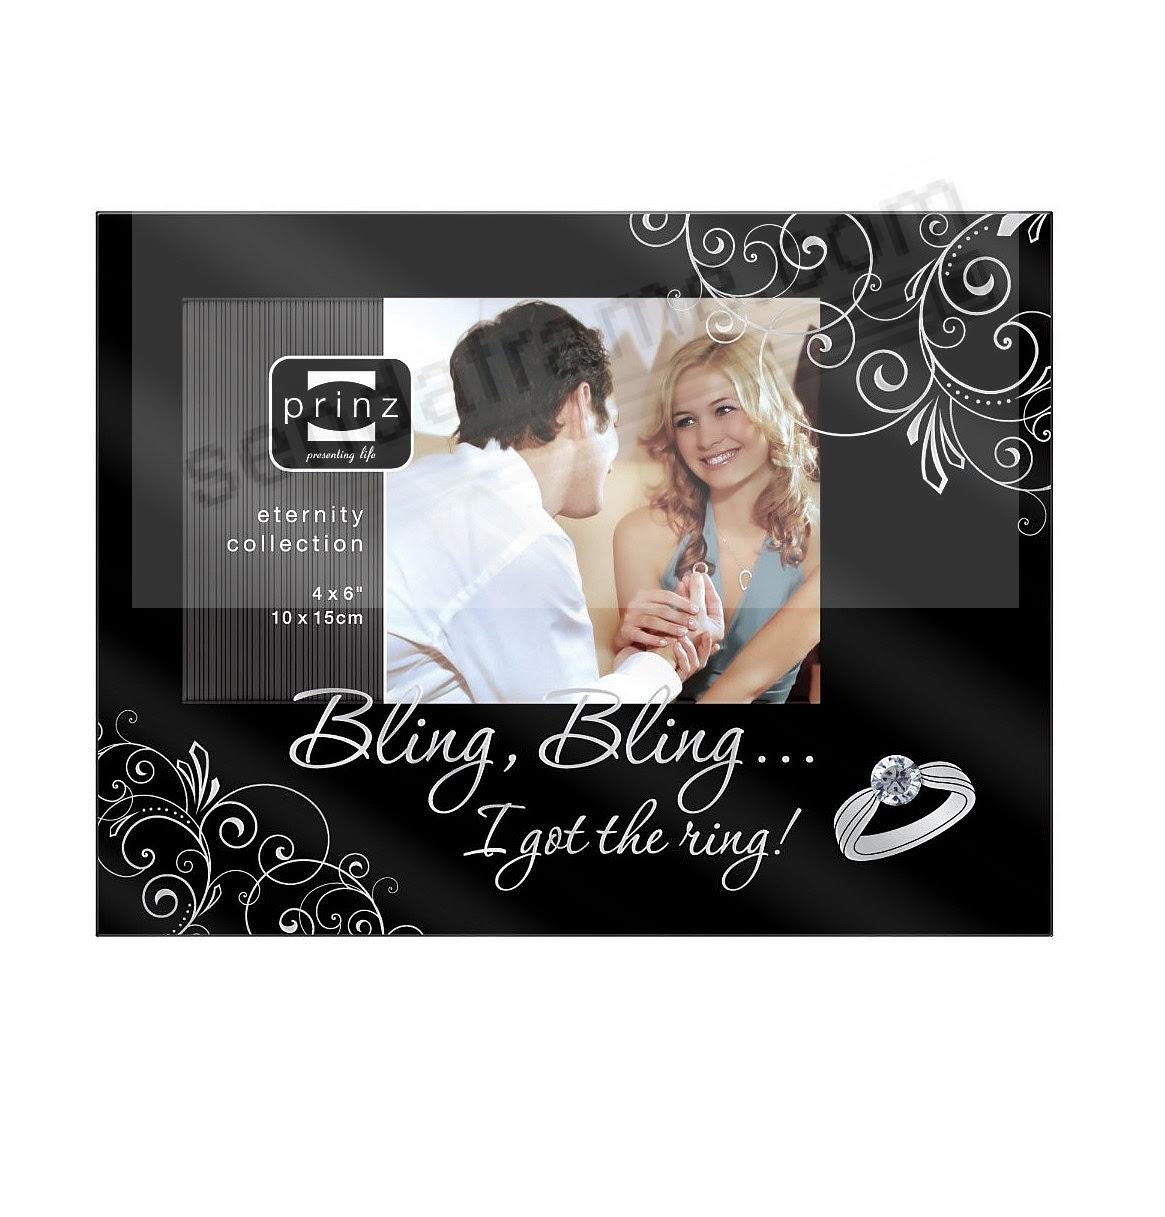 Ibling Blingi Got The Ringi Black Wood Frame By Prinz